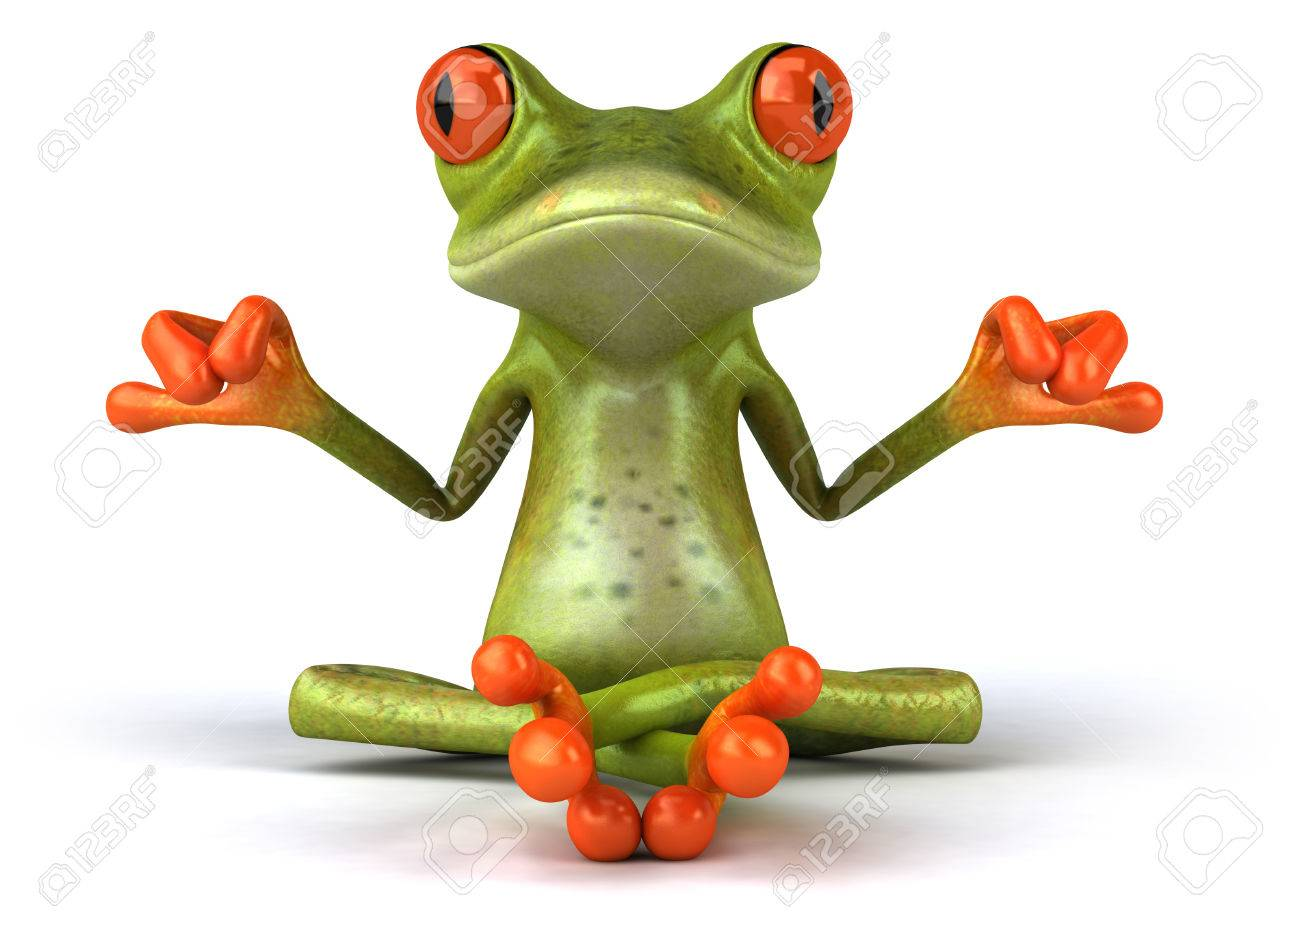 Cartoon frog in meditating pose - 80224543